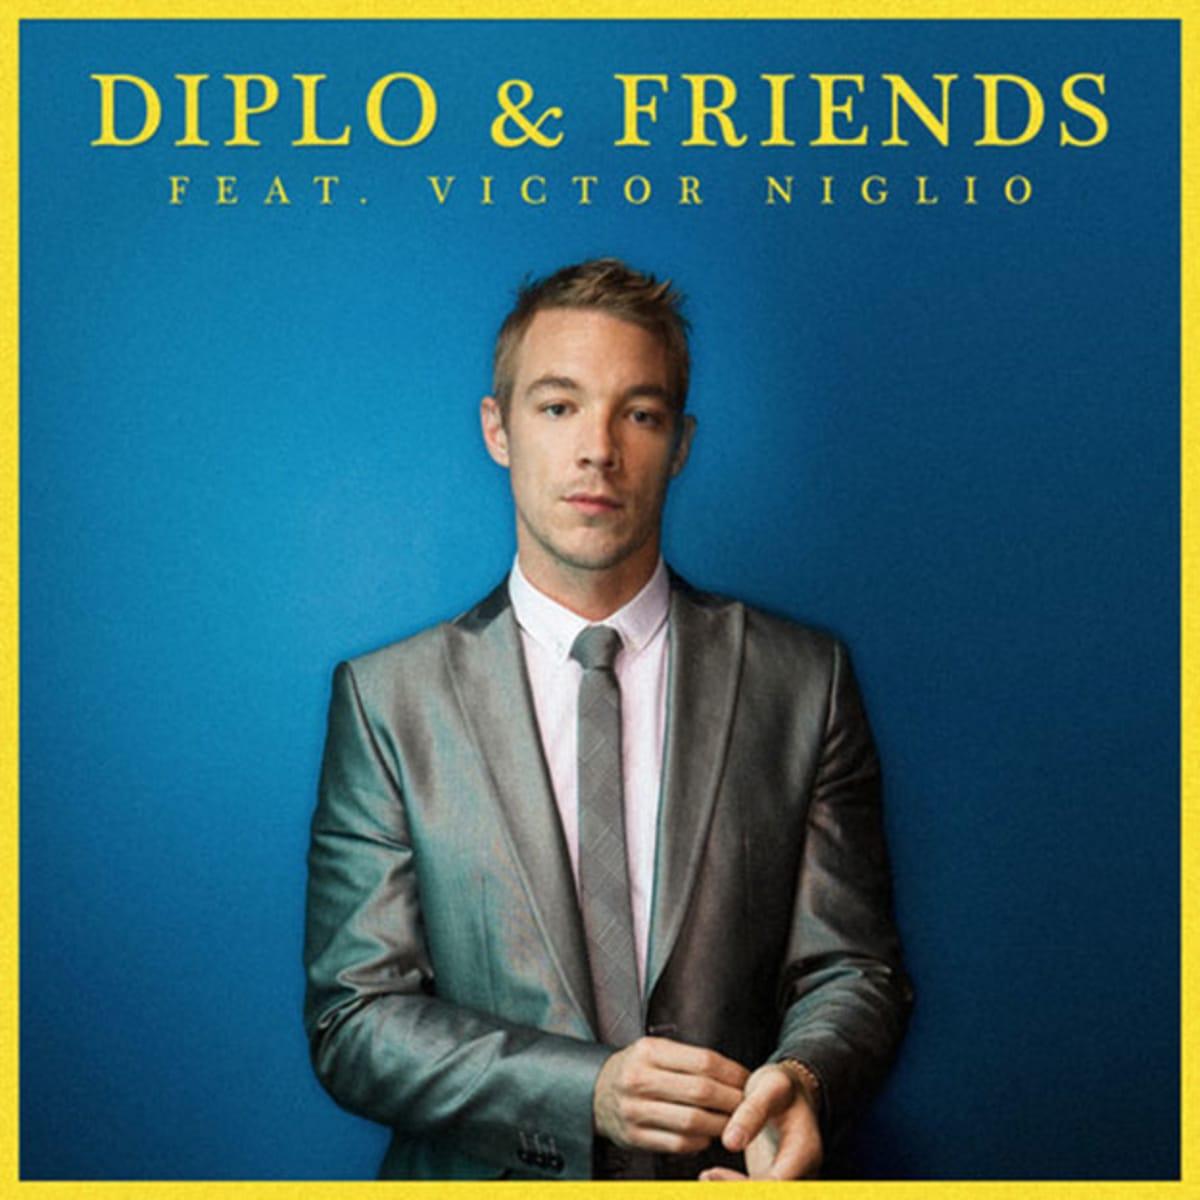 Download Victor Niglio's Diplo & Friends Guest Mix